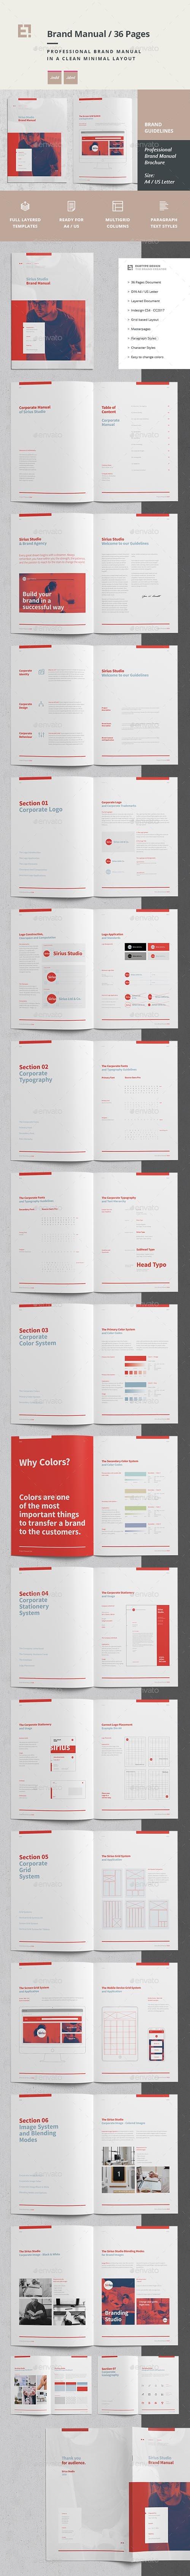 GR - Brand Manual 21418602